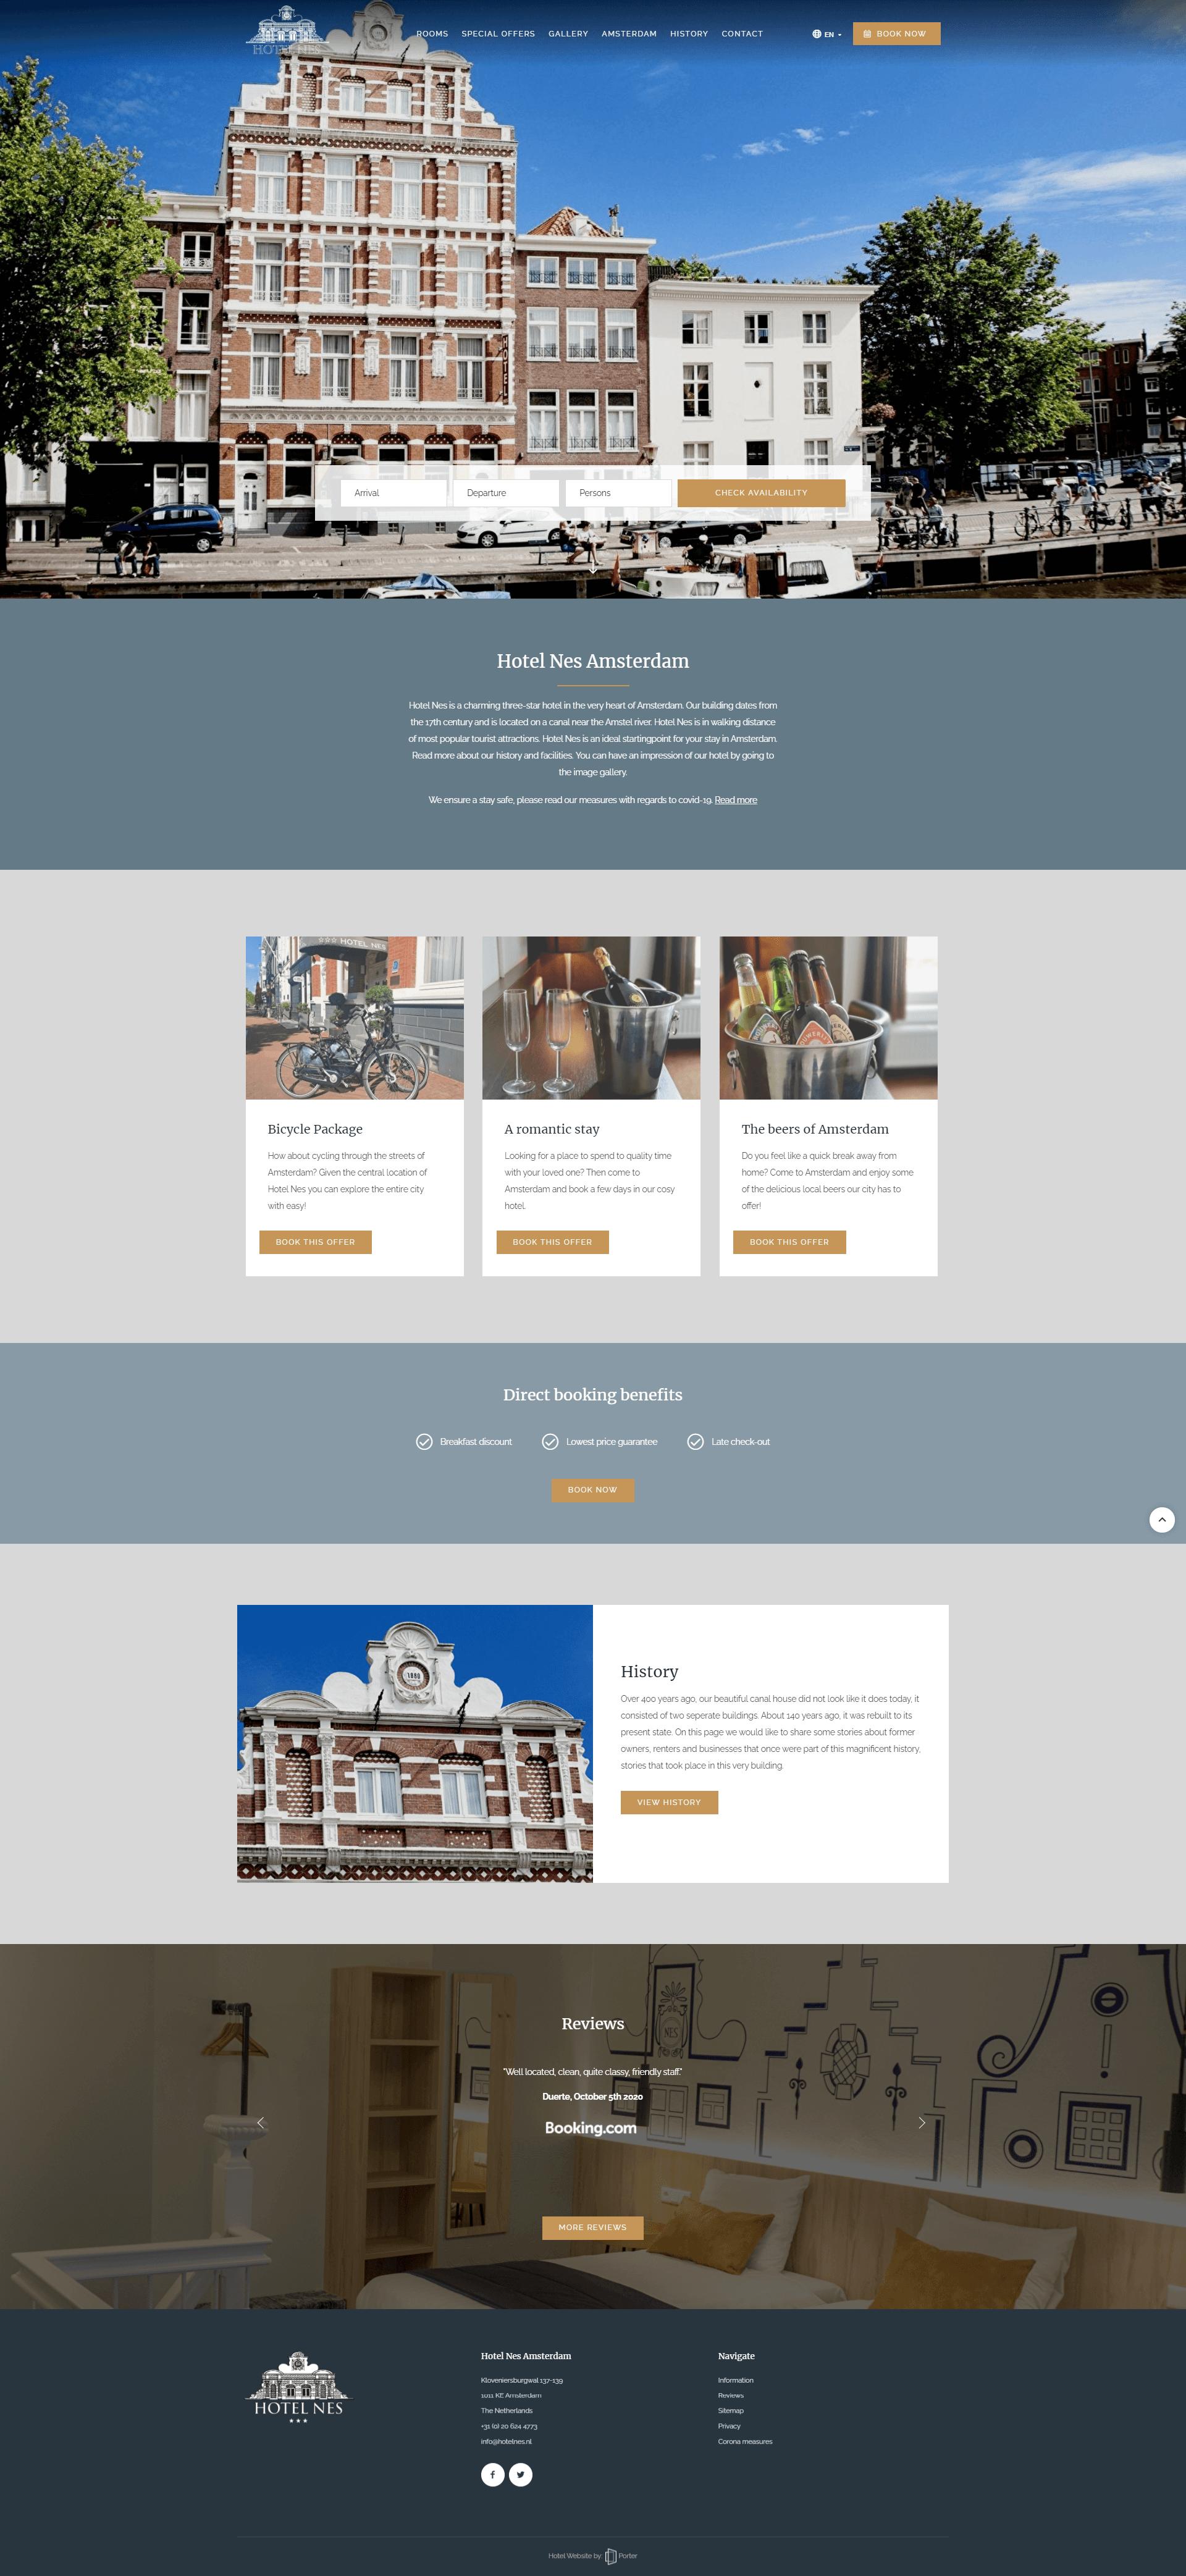 Hotel Nes Amsterdam